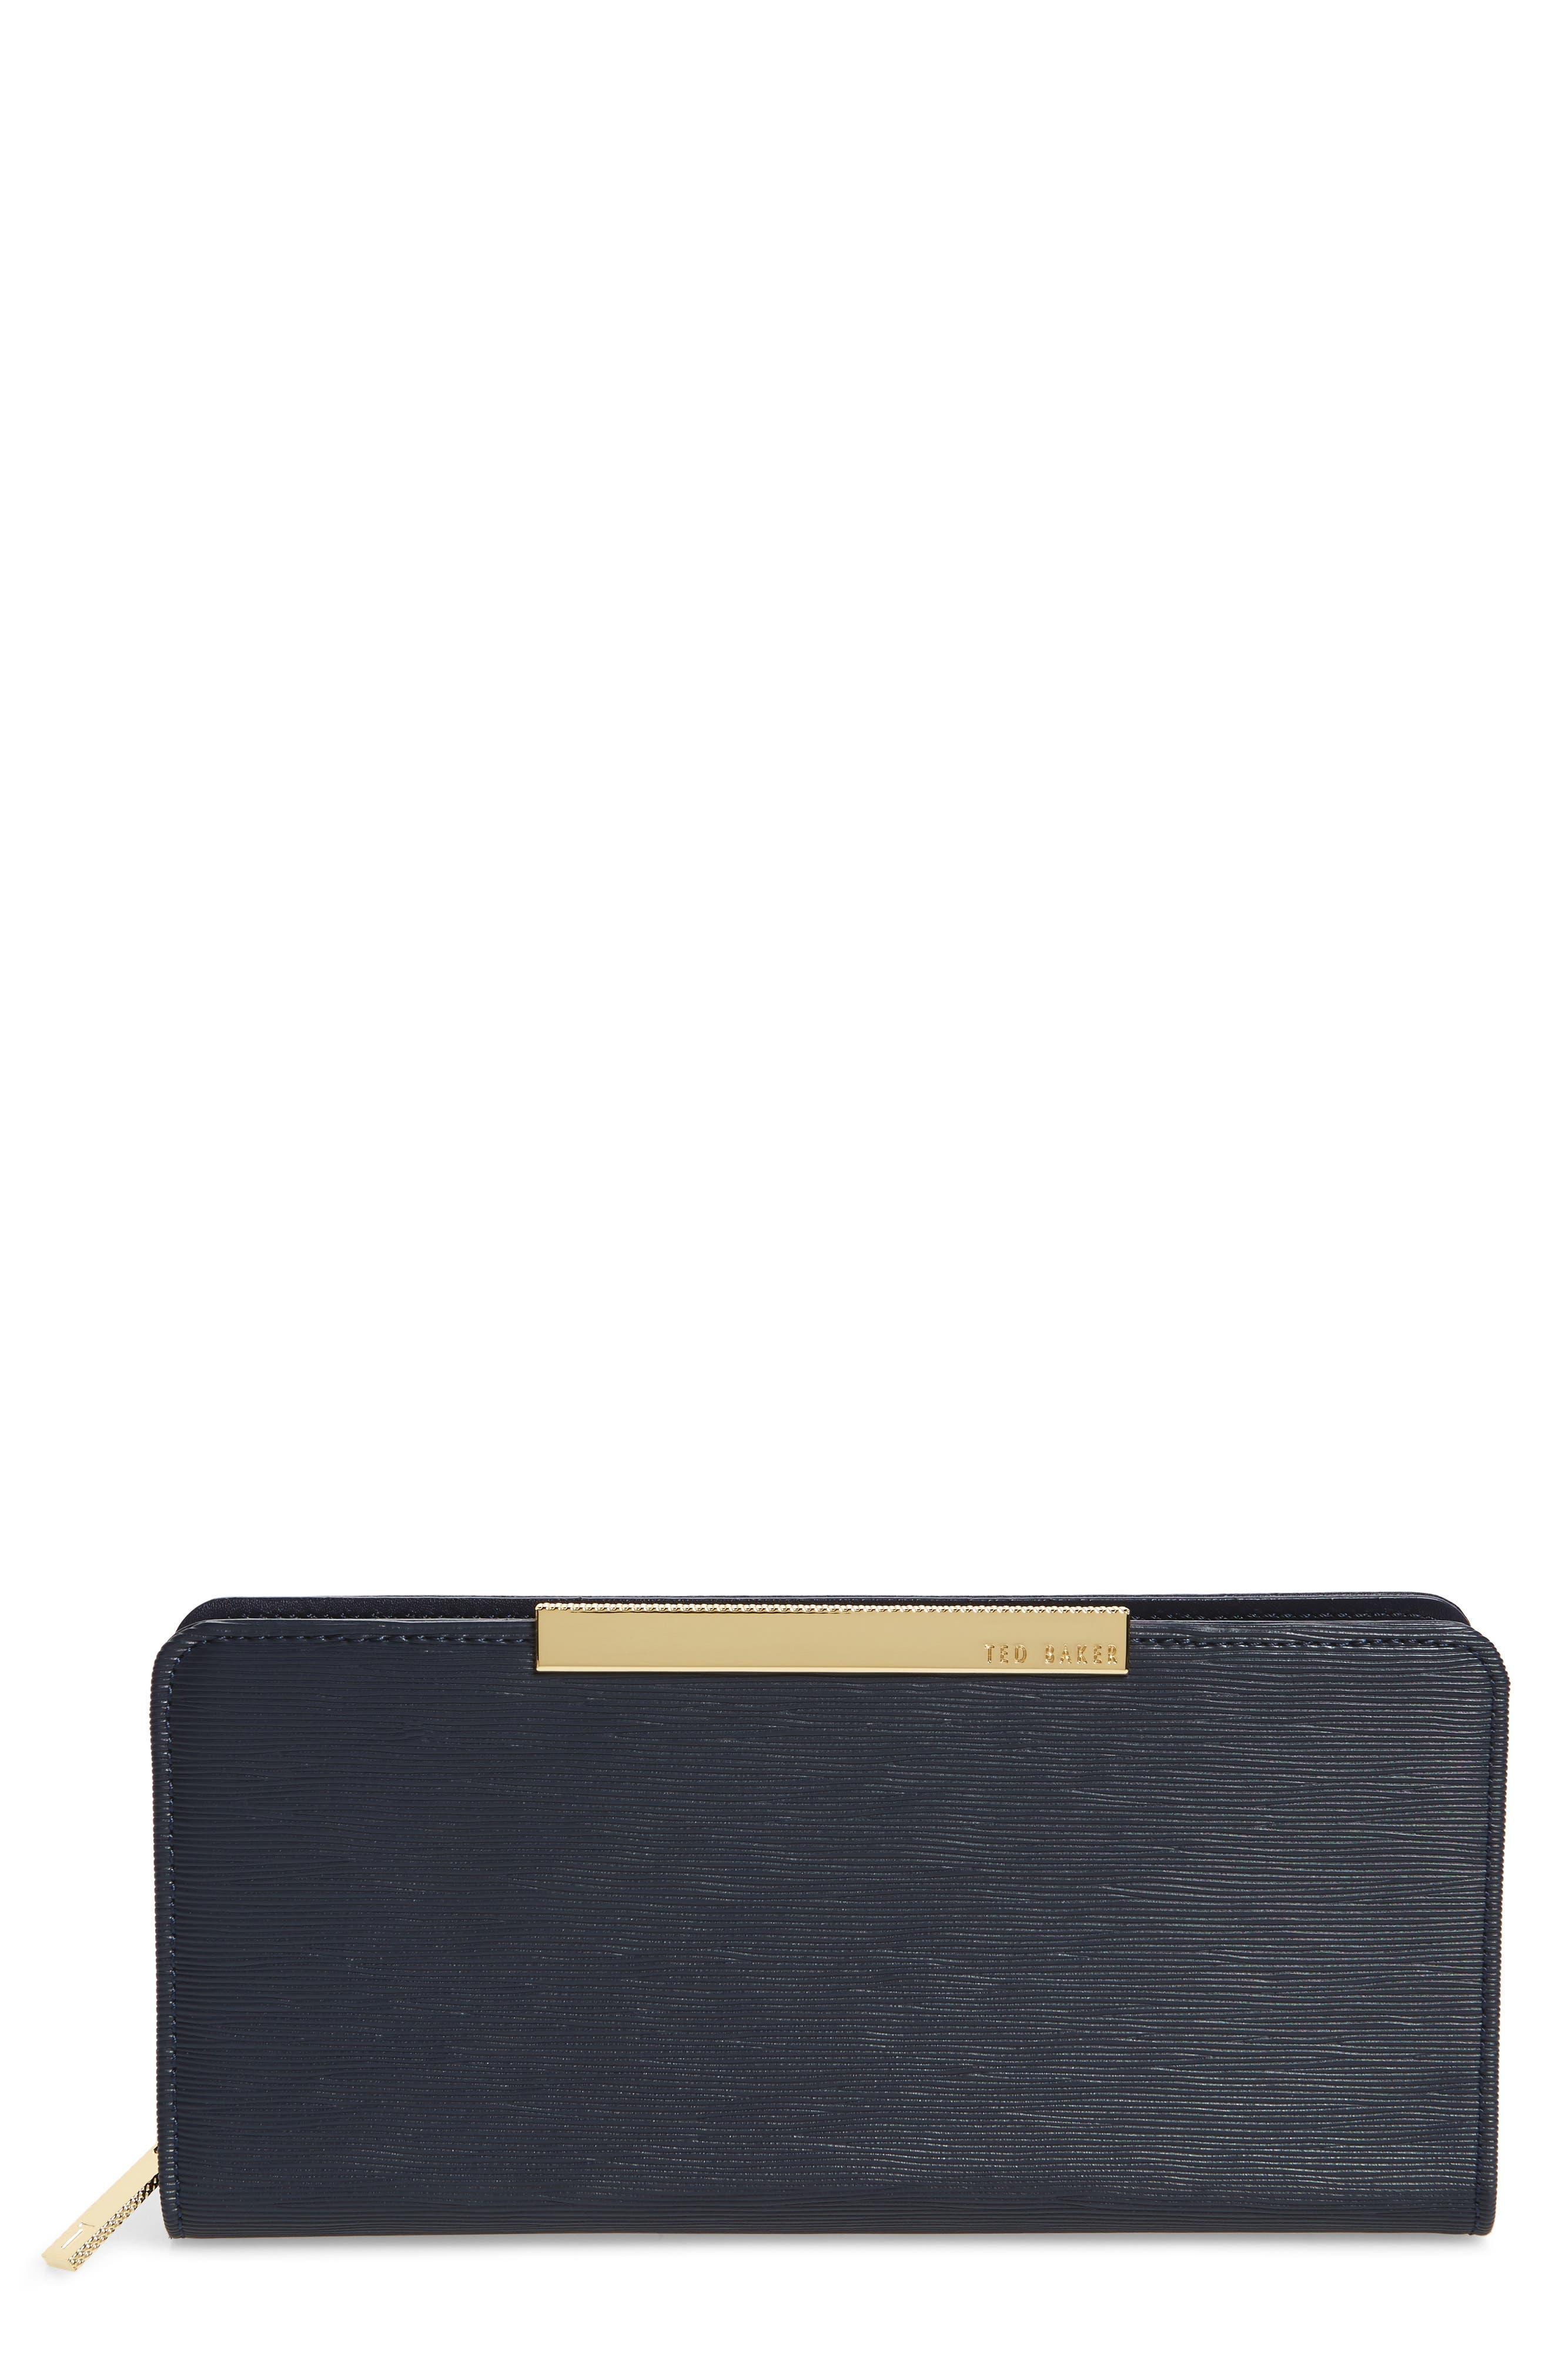 Alternate Image 1 Selected - Ted Baker London Marya Plissé Leather Matinee Wallet